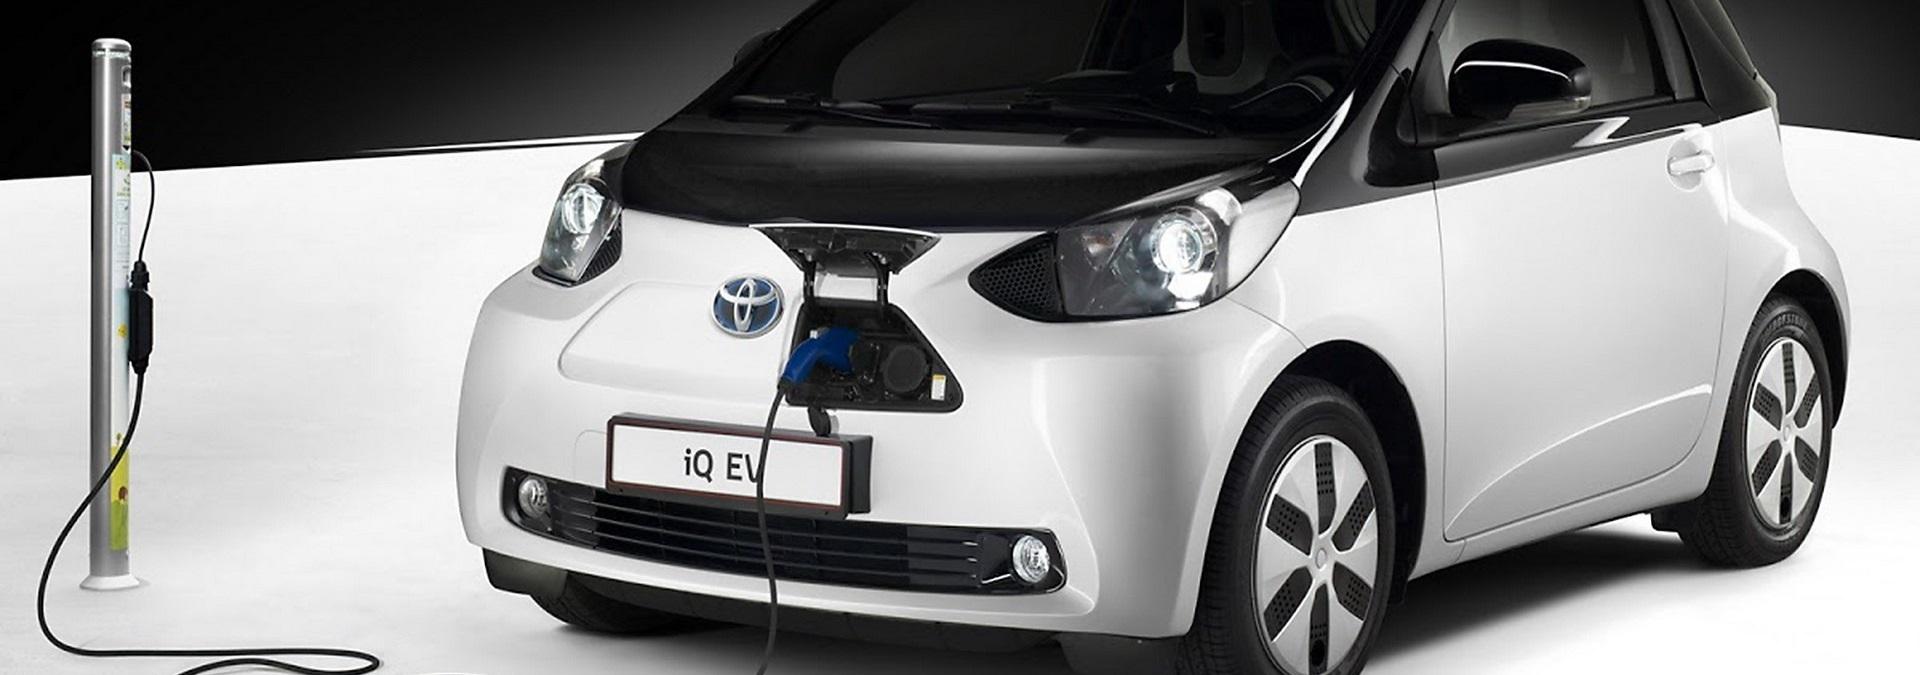 Toyota IQ_EV_1920